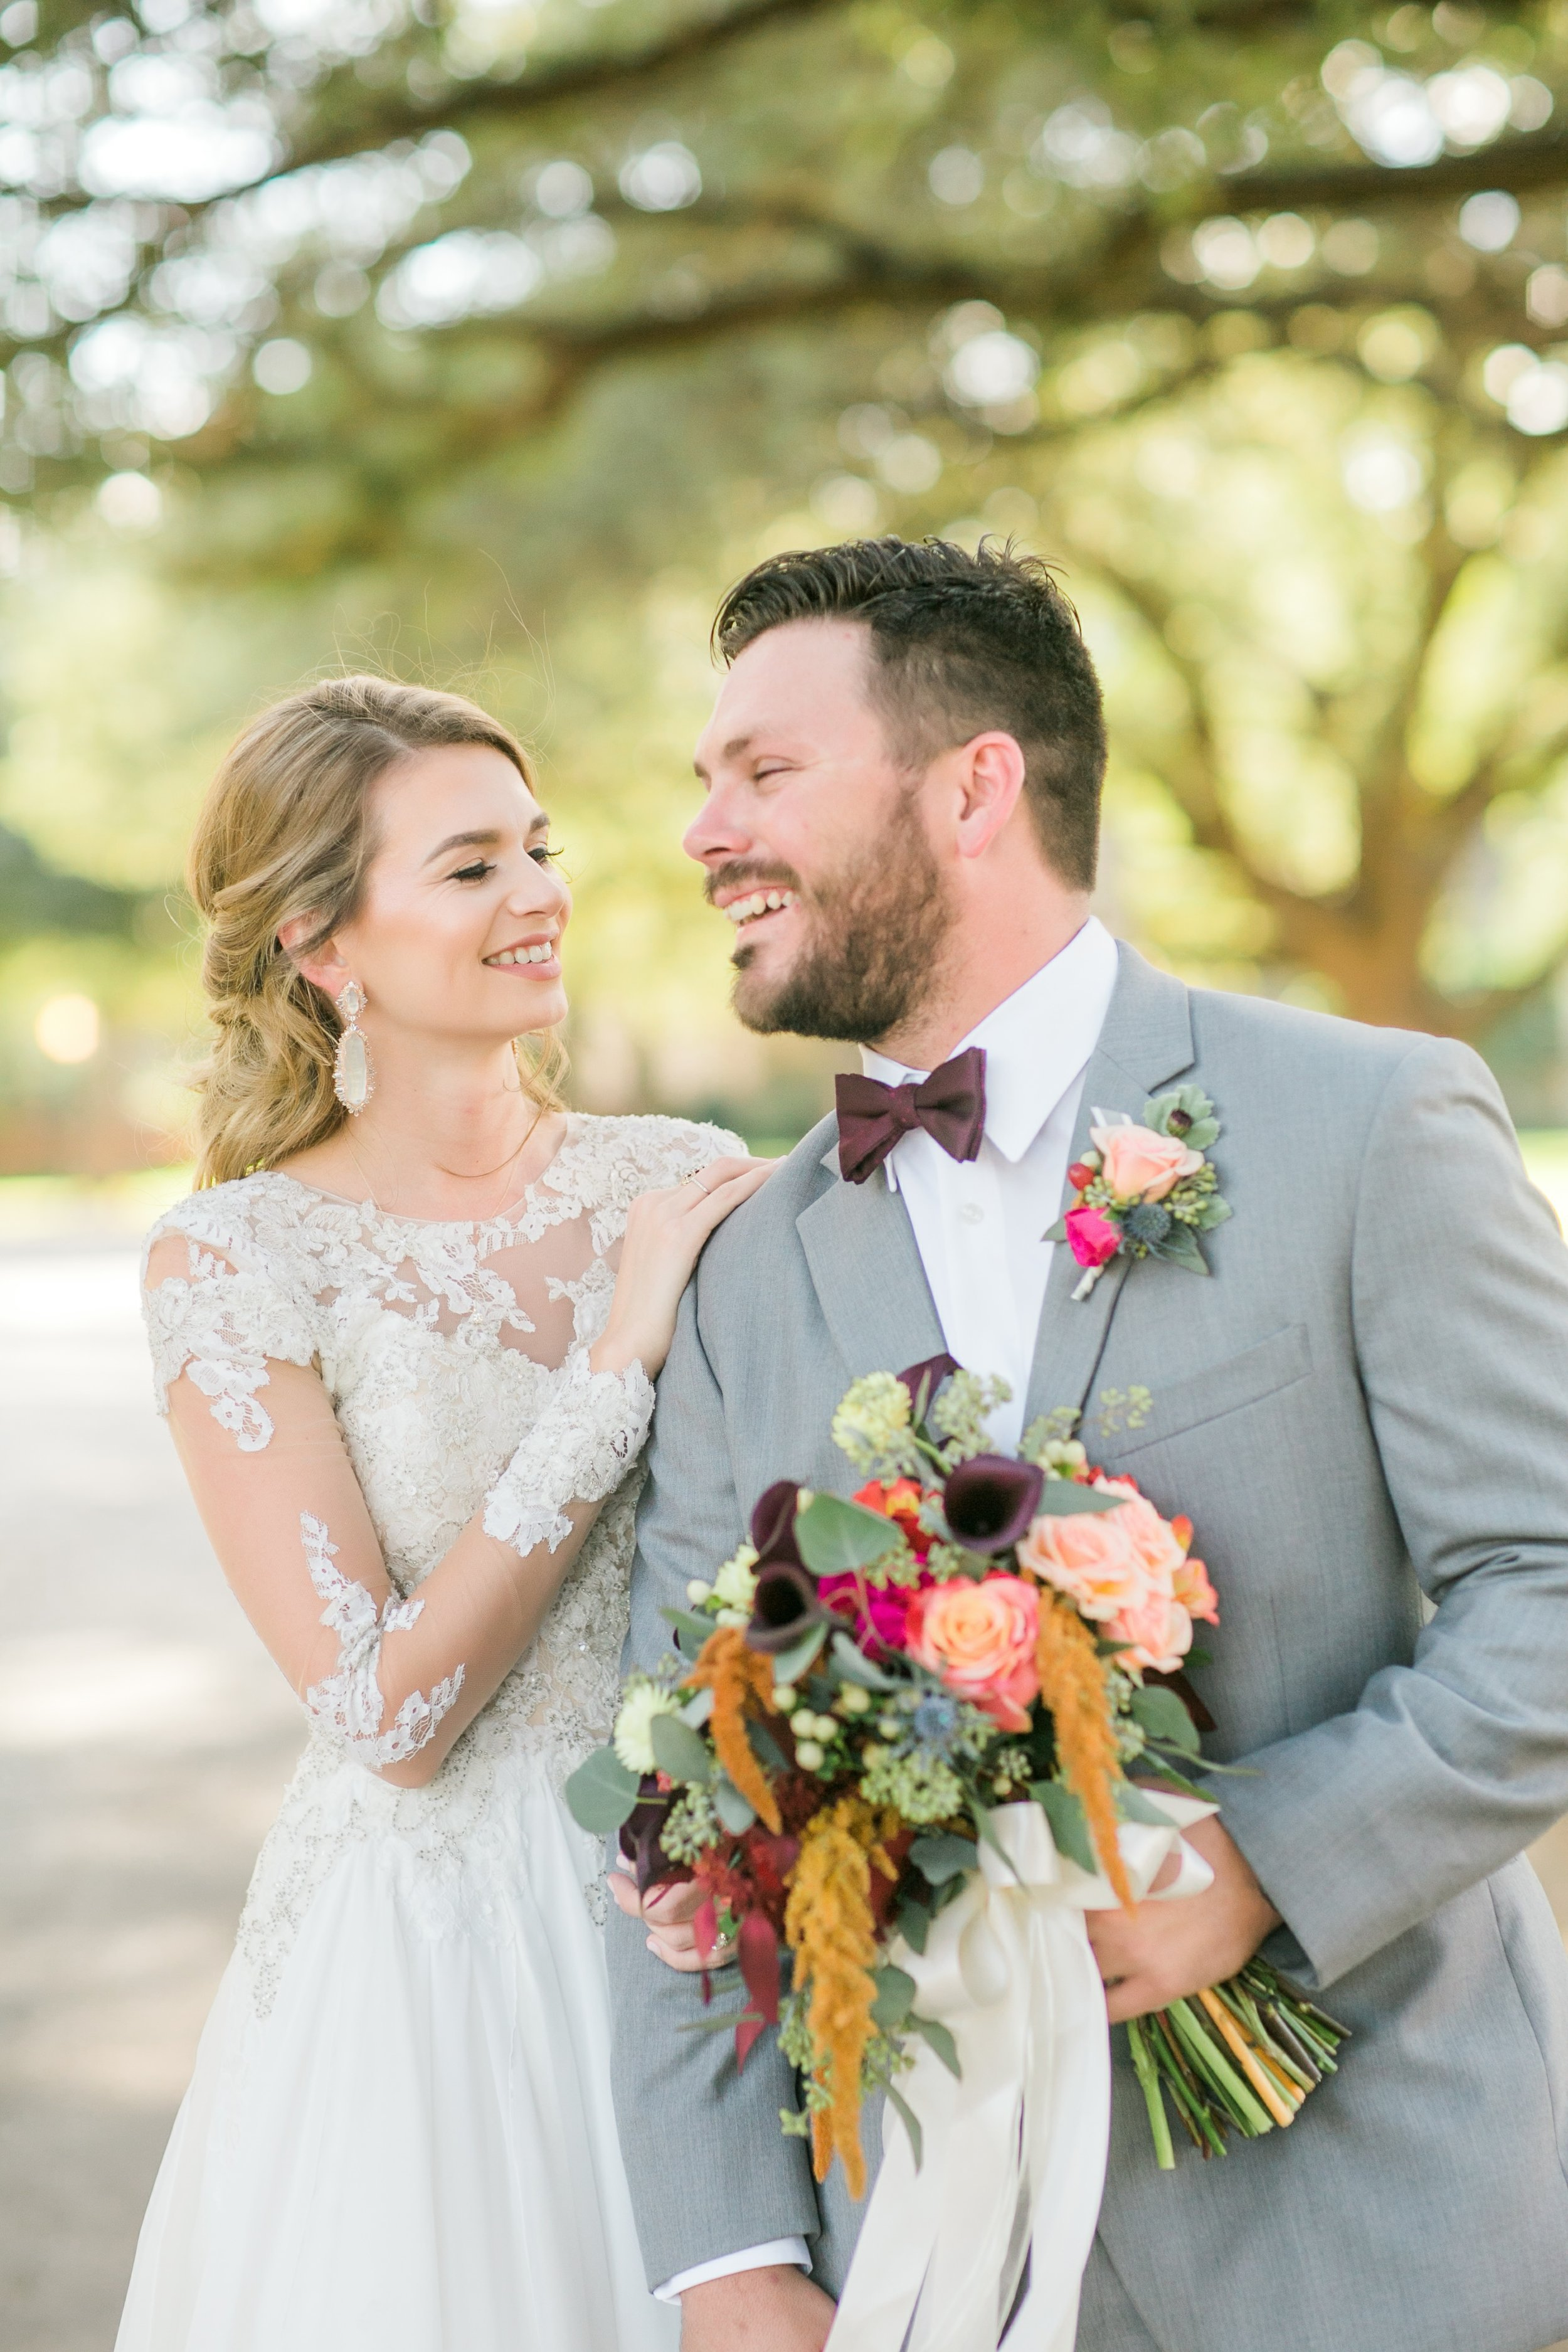 Roberson-Wedding-The-Forum-Lauren-Pinson-Wedding-Photography-Wichita-Falls-Texas-047.jpg